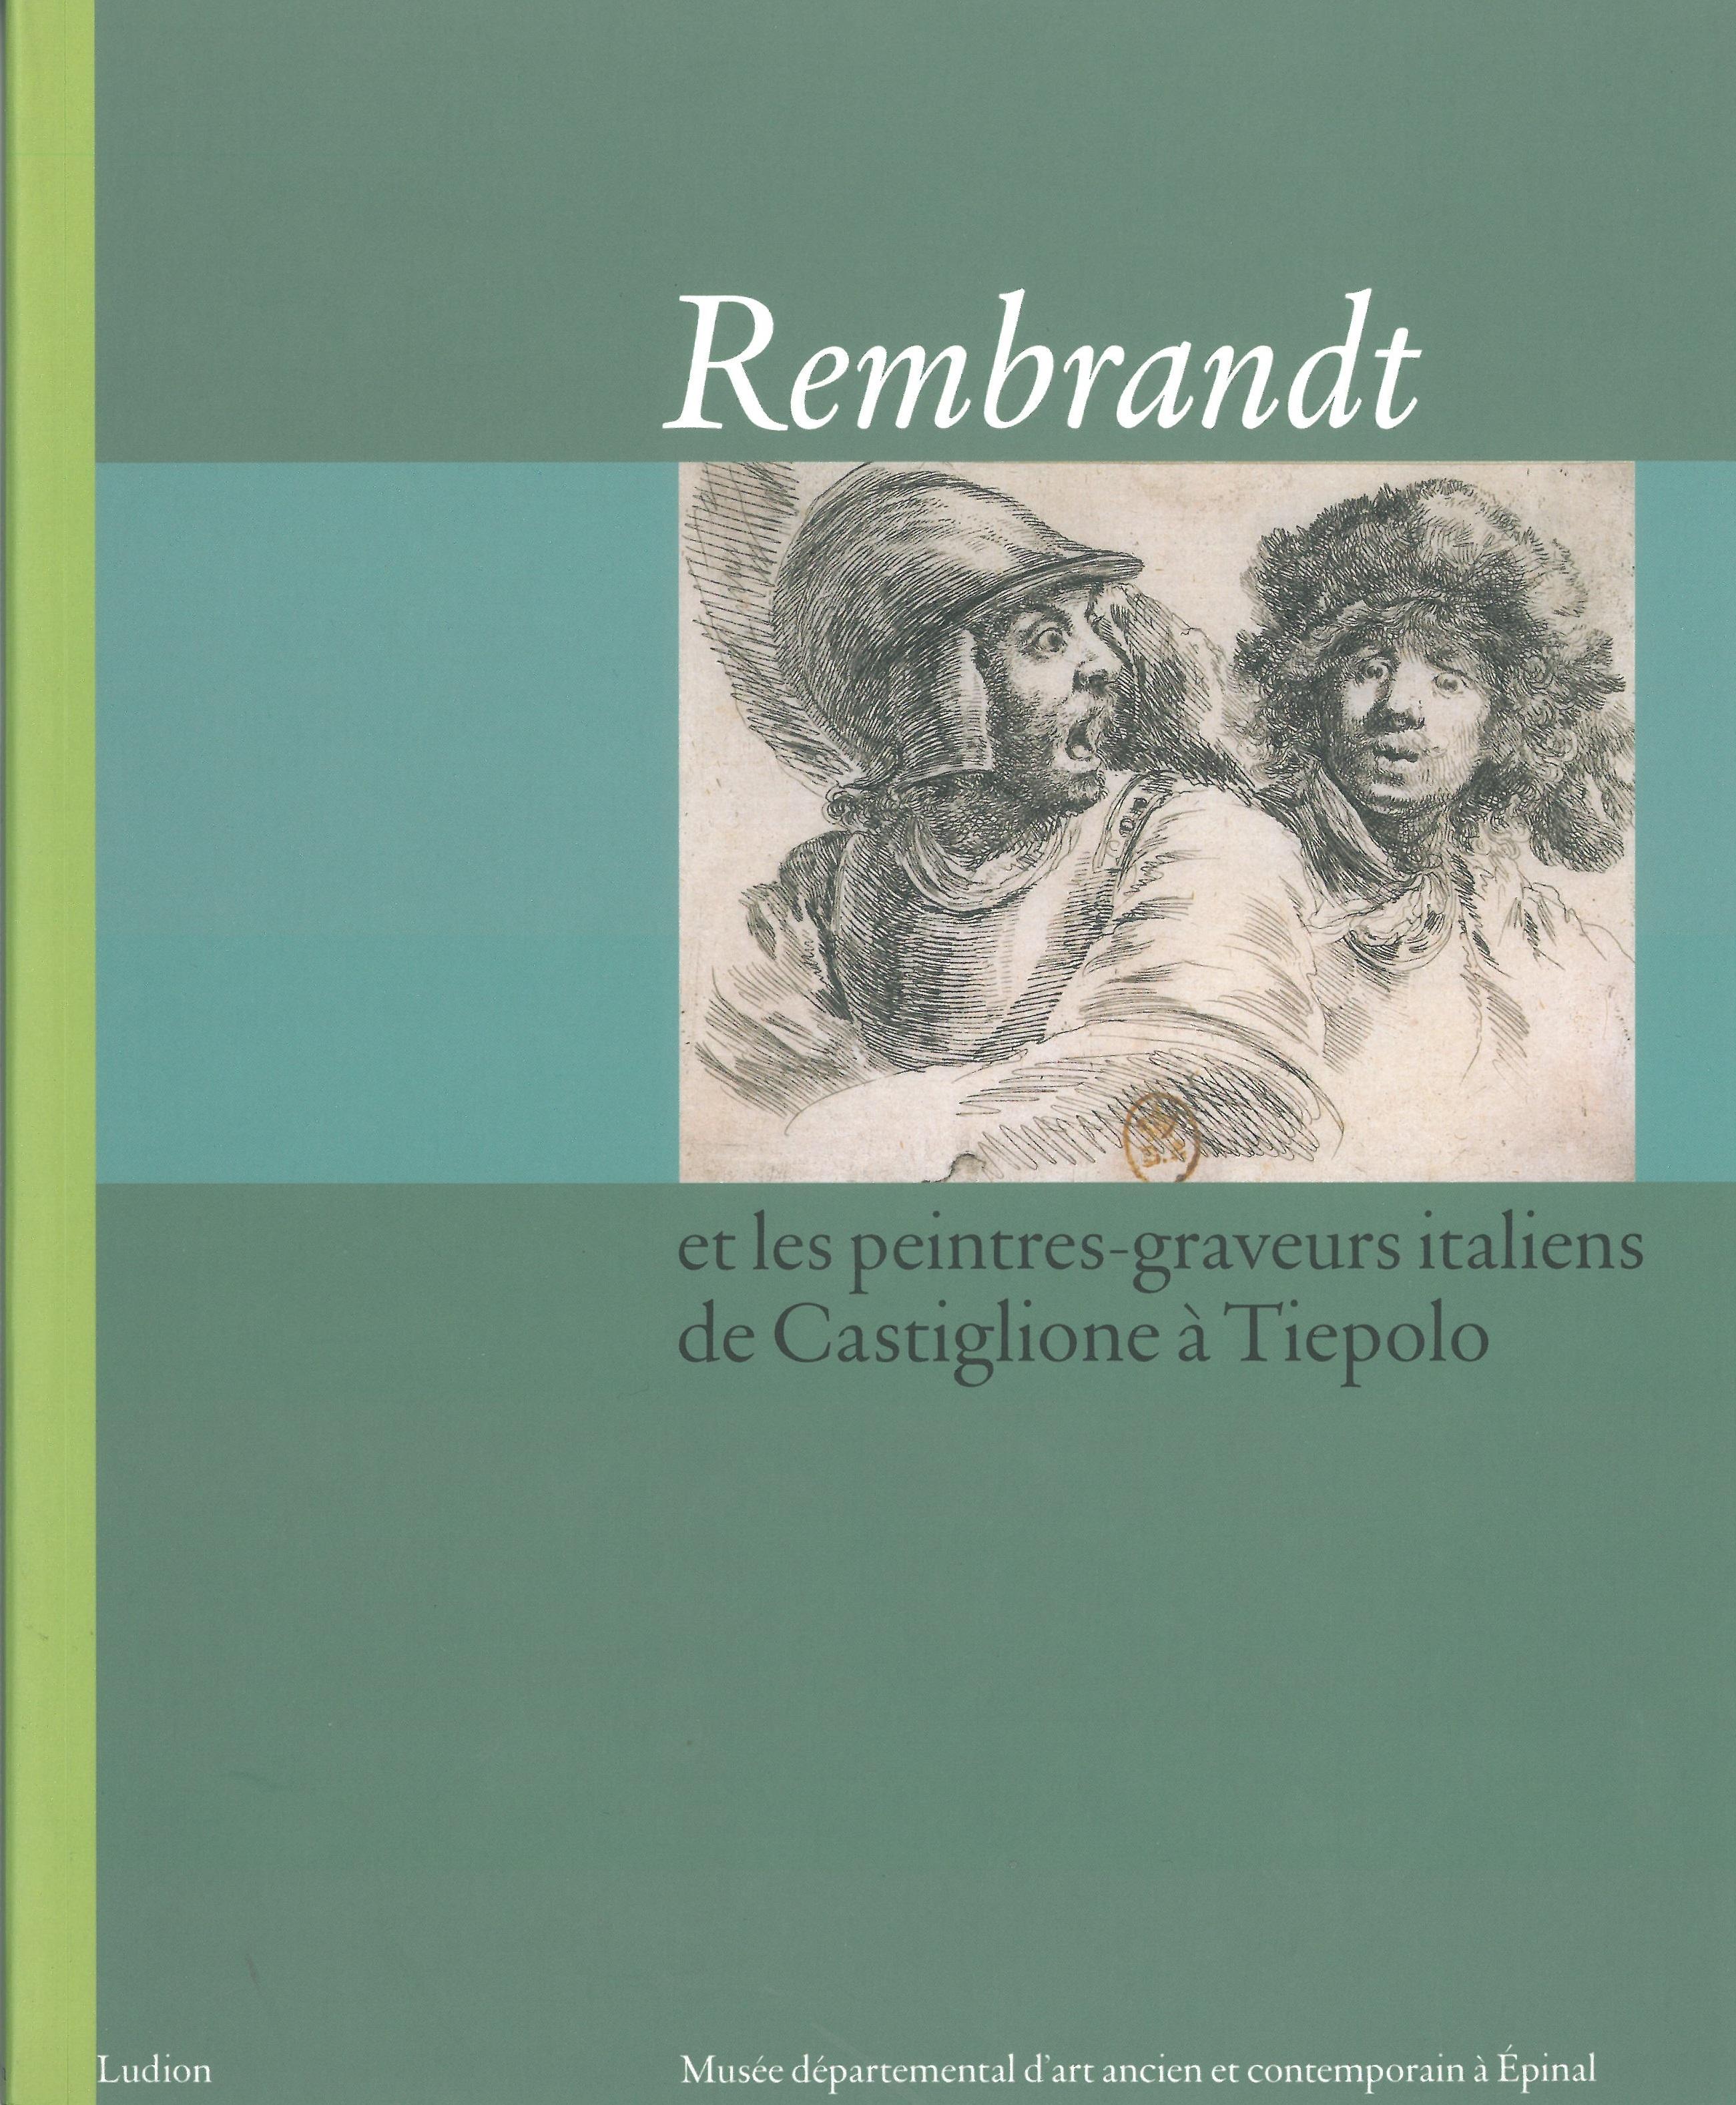 Rembrandt 2003